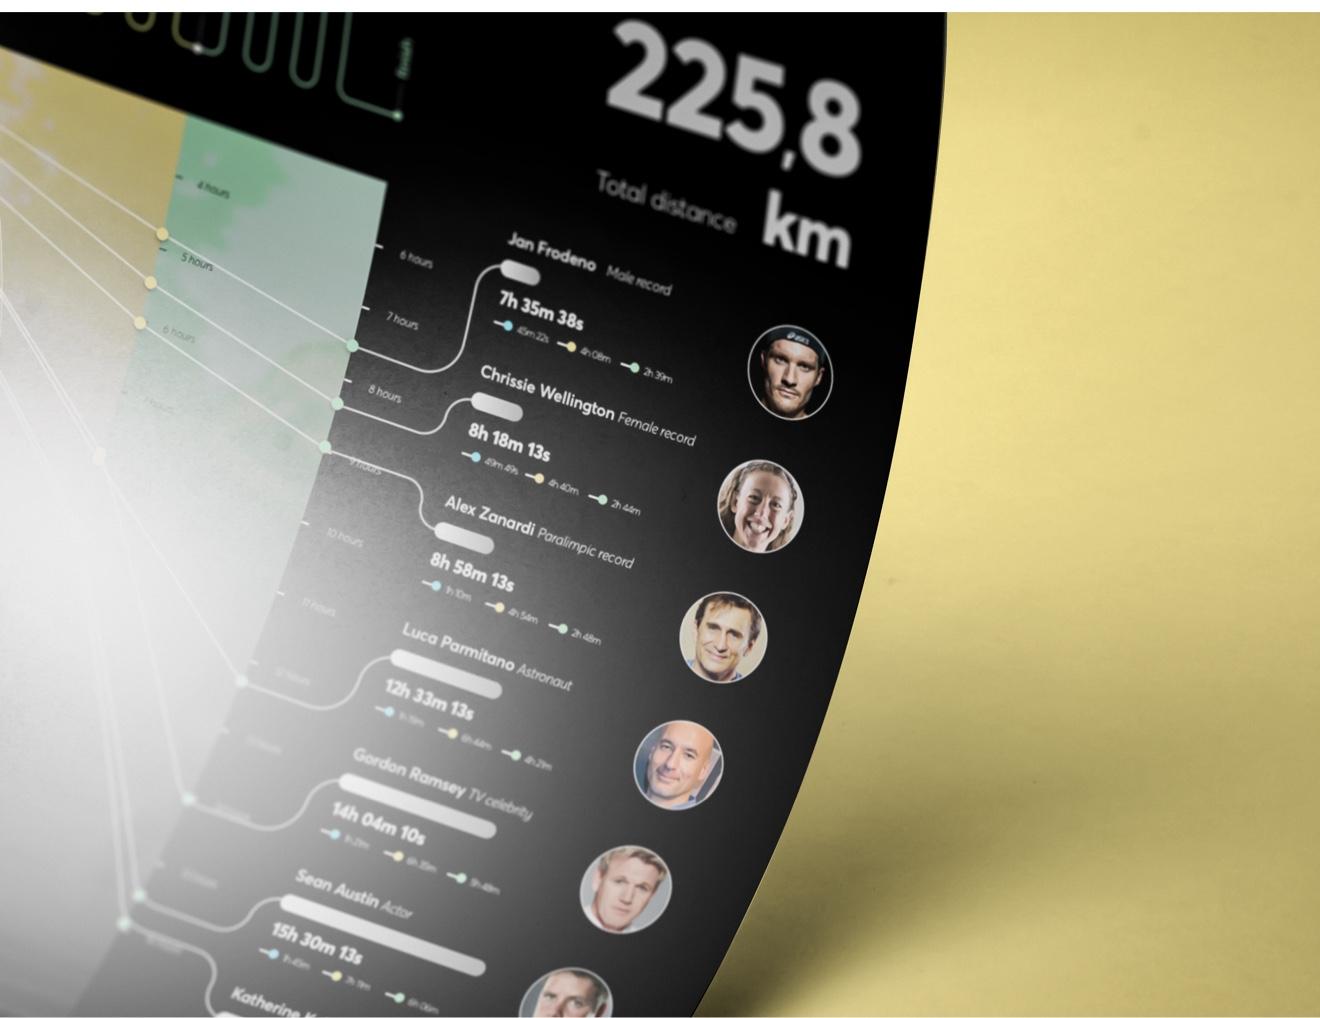 Ironman 2017 Data visualization Cover 2 - Fabio Besti Interdisciplinary Design